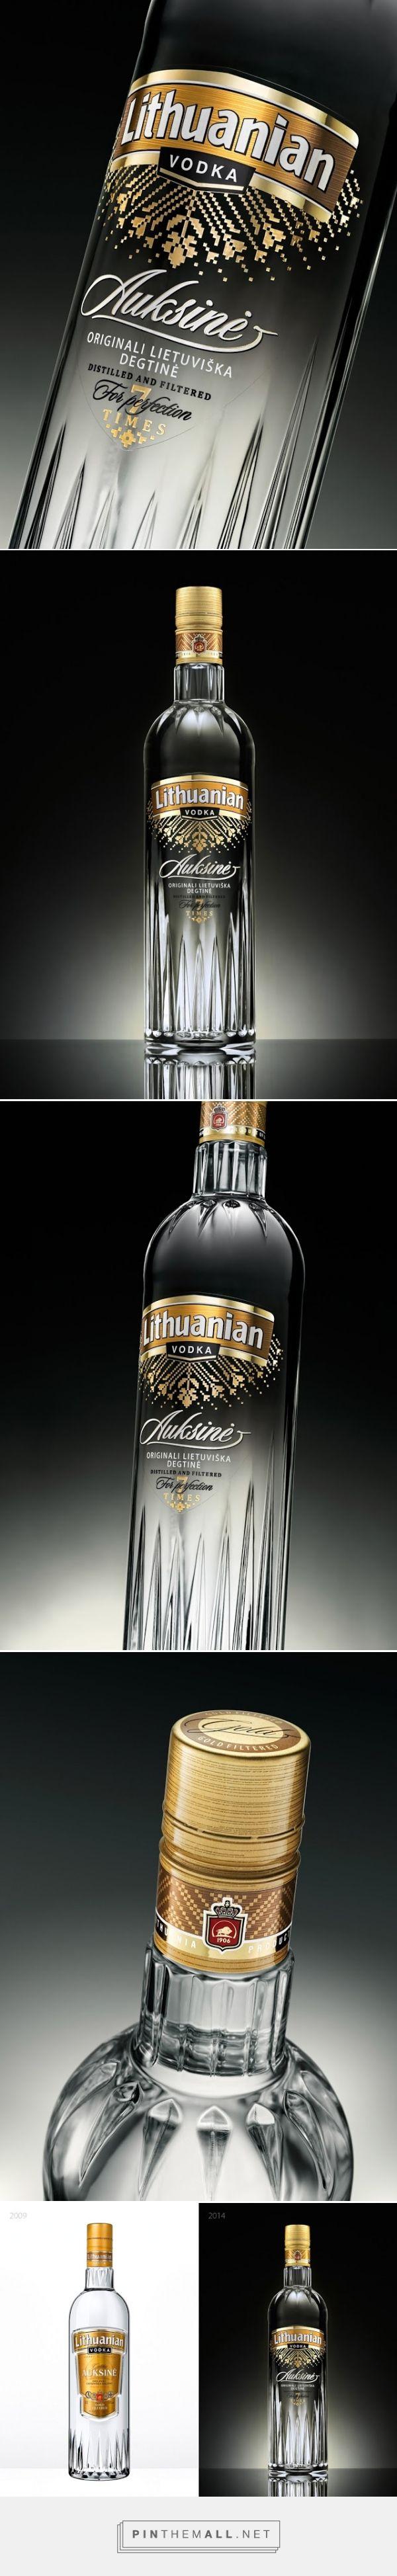 Lithuanian Vodka Gold #packaging by Studija CREATA - http://www.packagingoftheworld.com/2015/01/lithuanian-vodka-gold.html